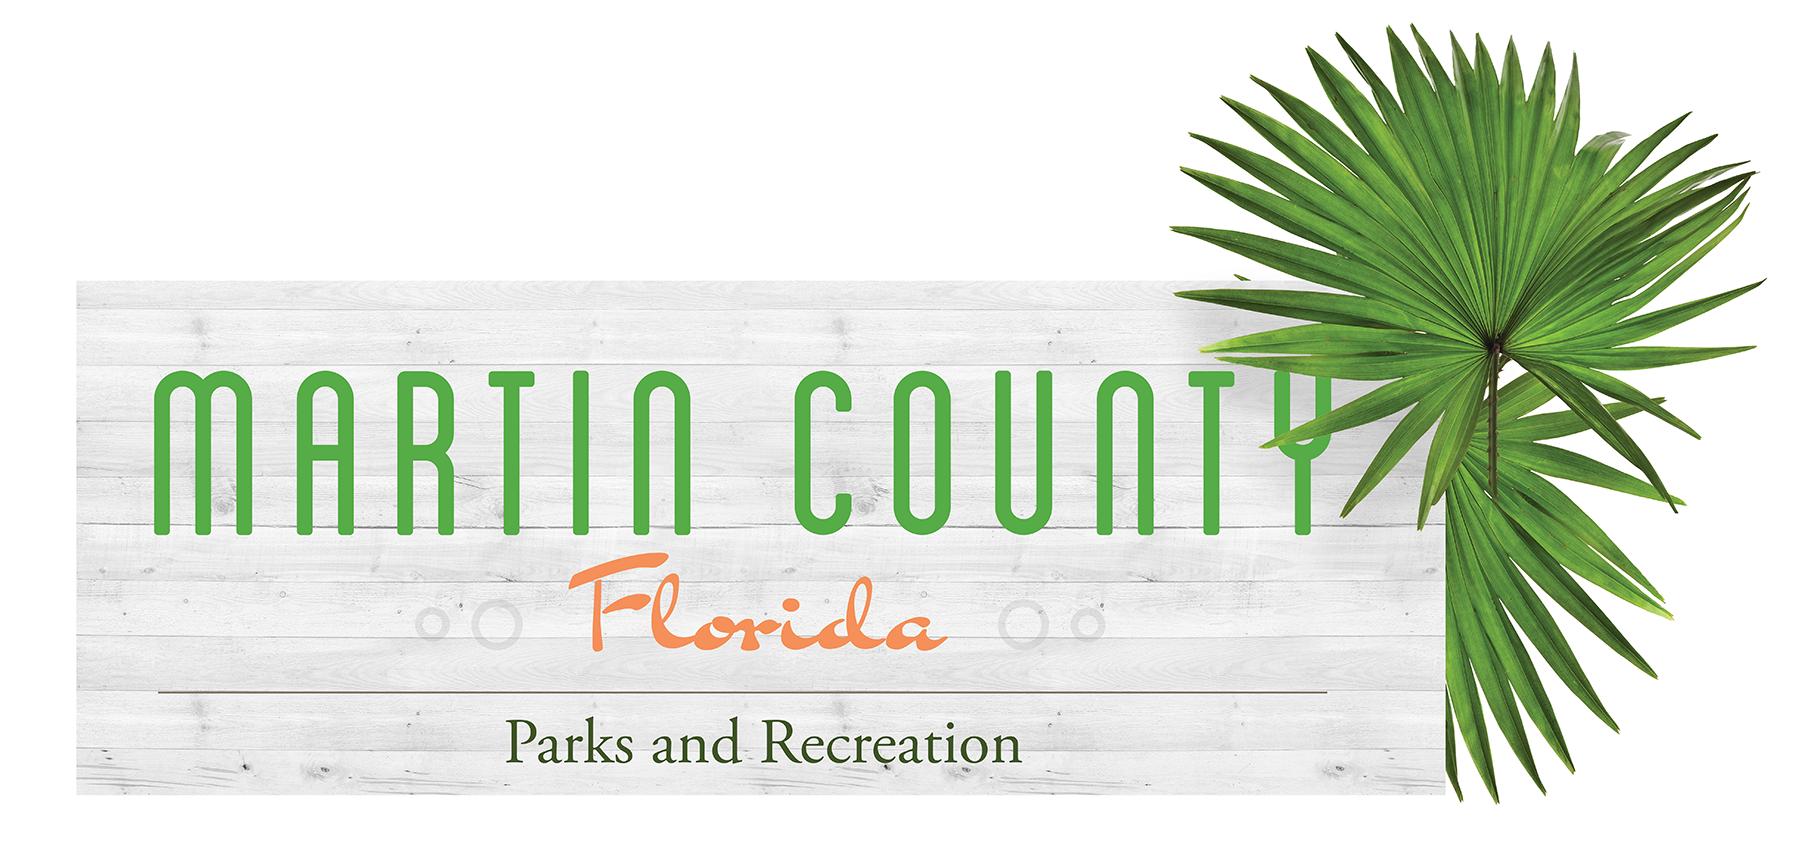 Parks and Rec Palm logo trans